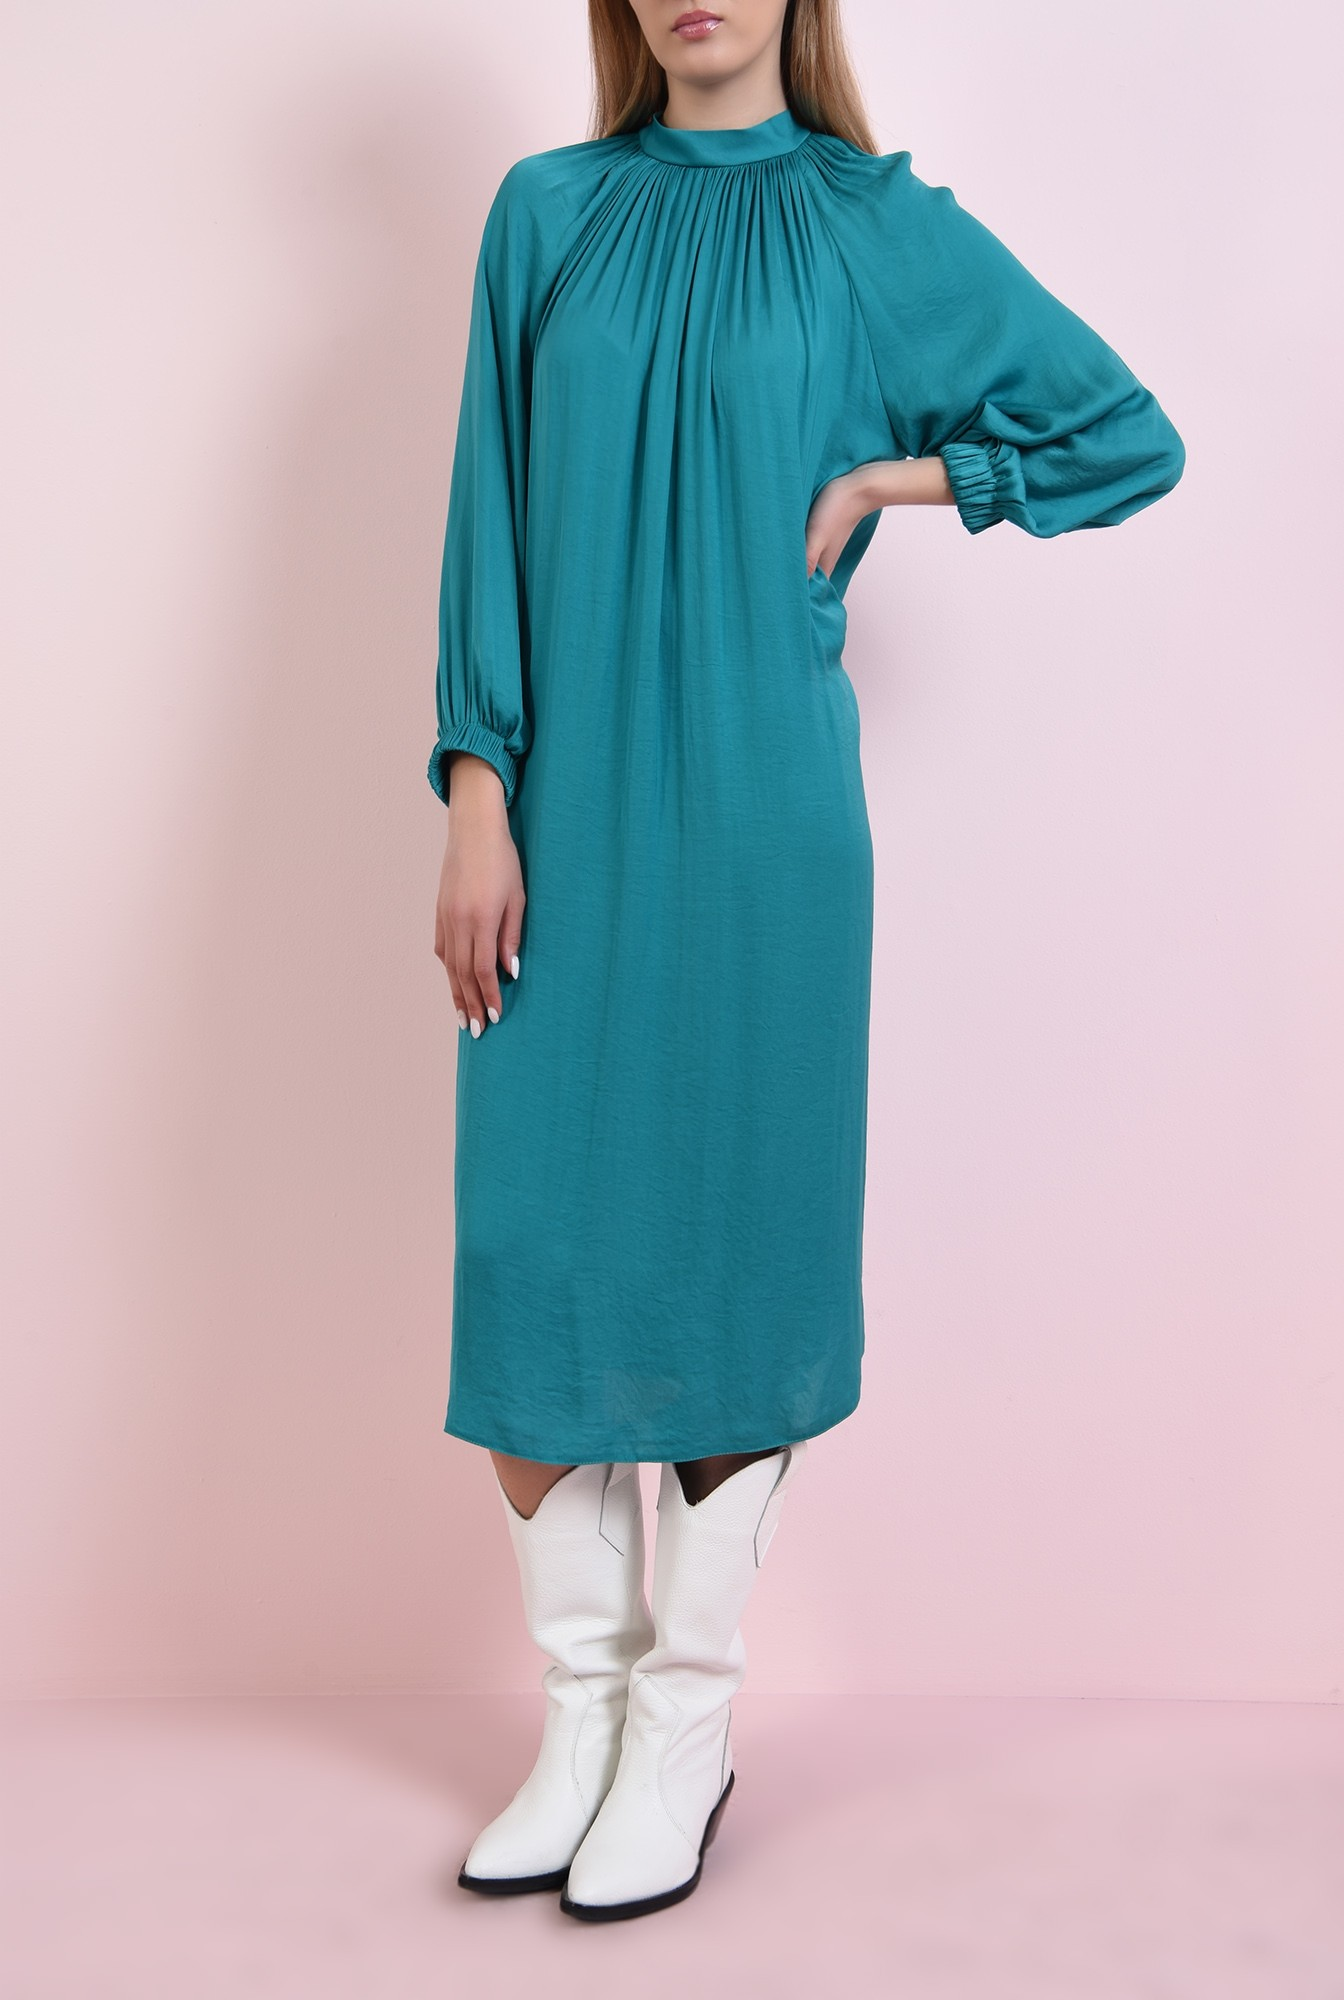 1 - 360 - rochie midi, verde, din satin